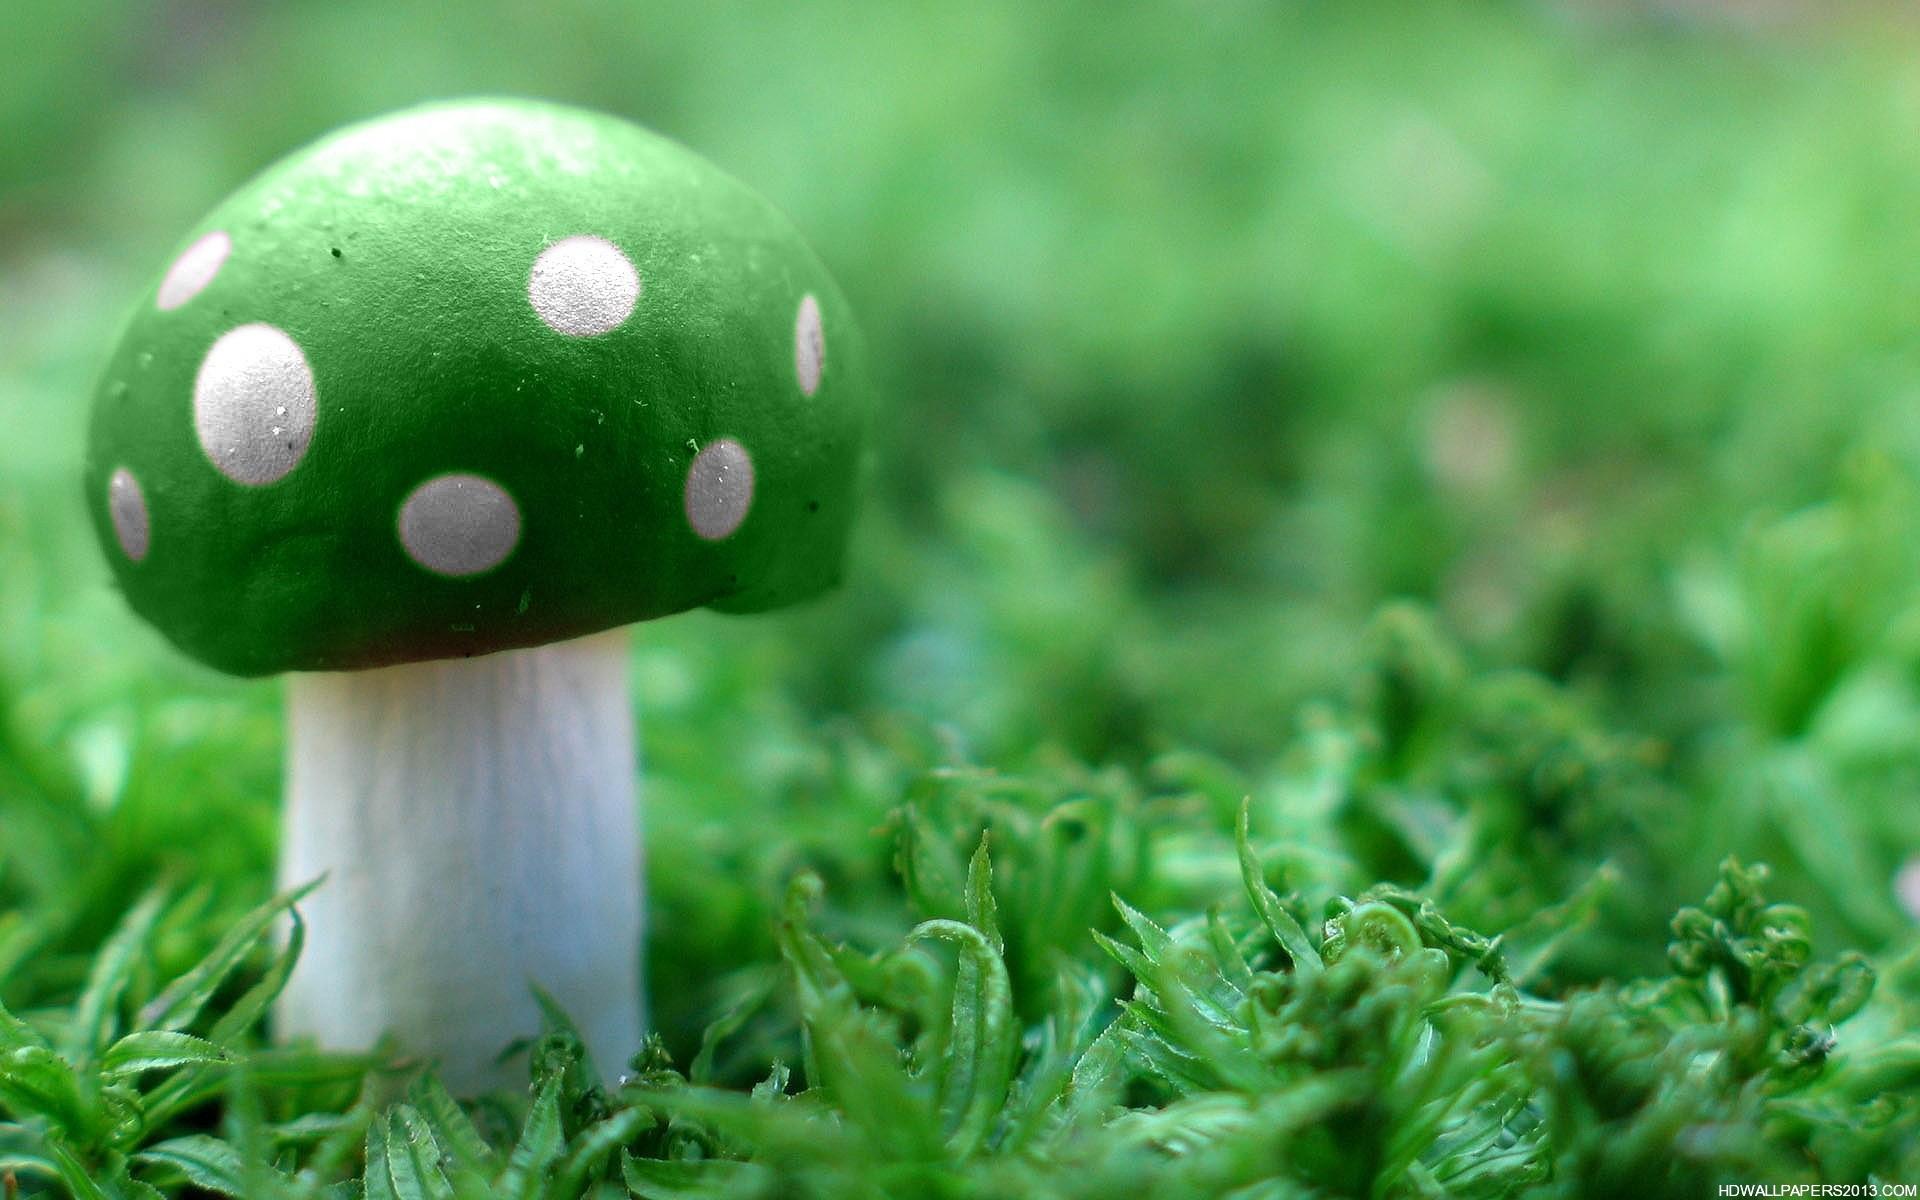 green mushroom wallpaper hd wallpapers green mushroom wallpaper hd 1920x1200